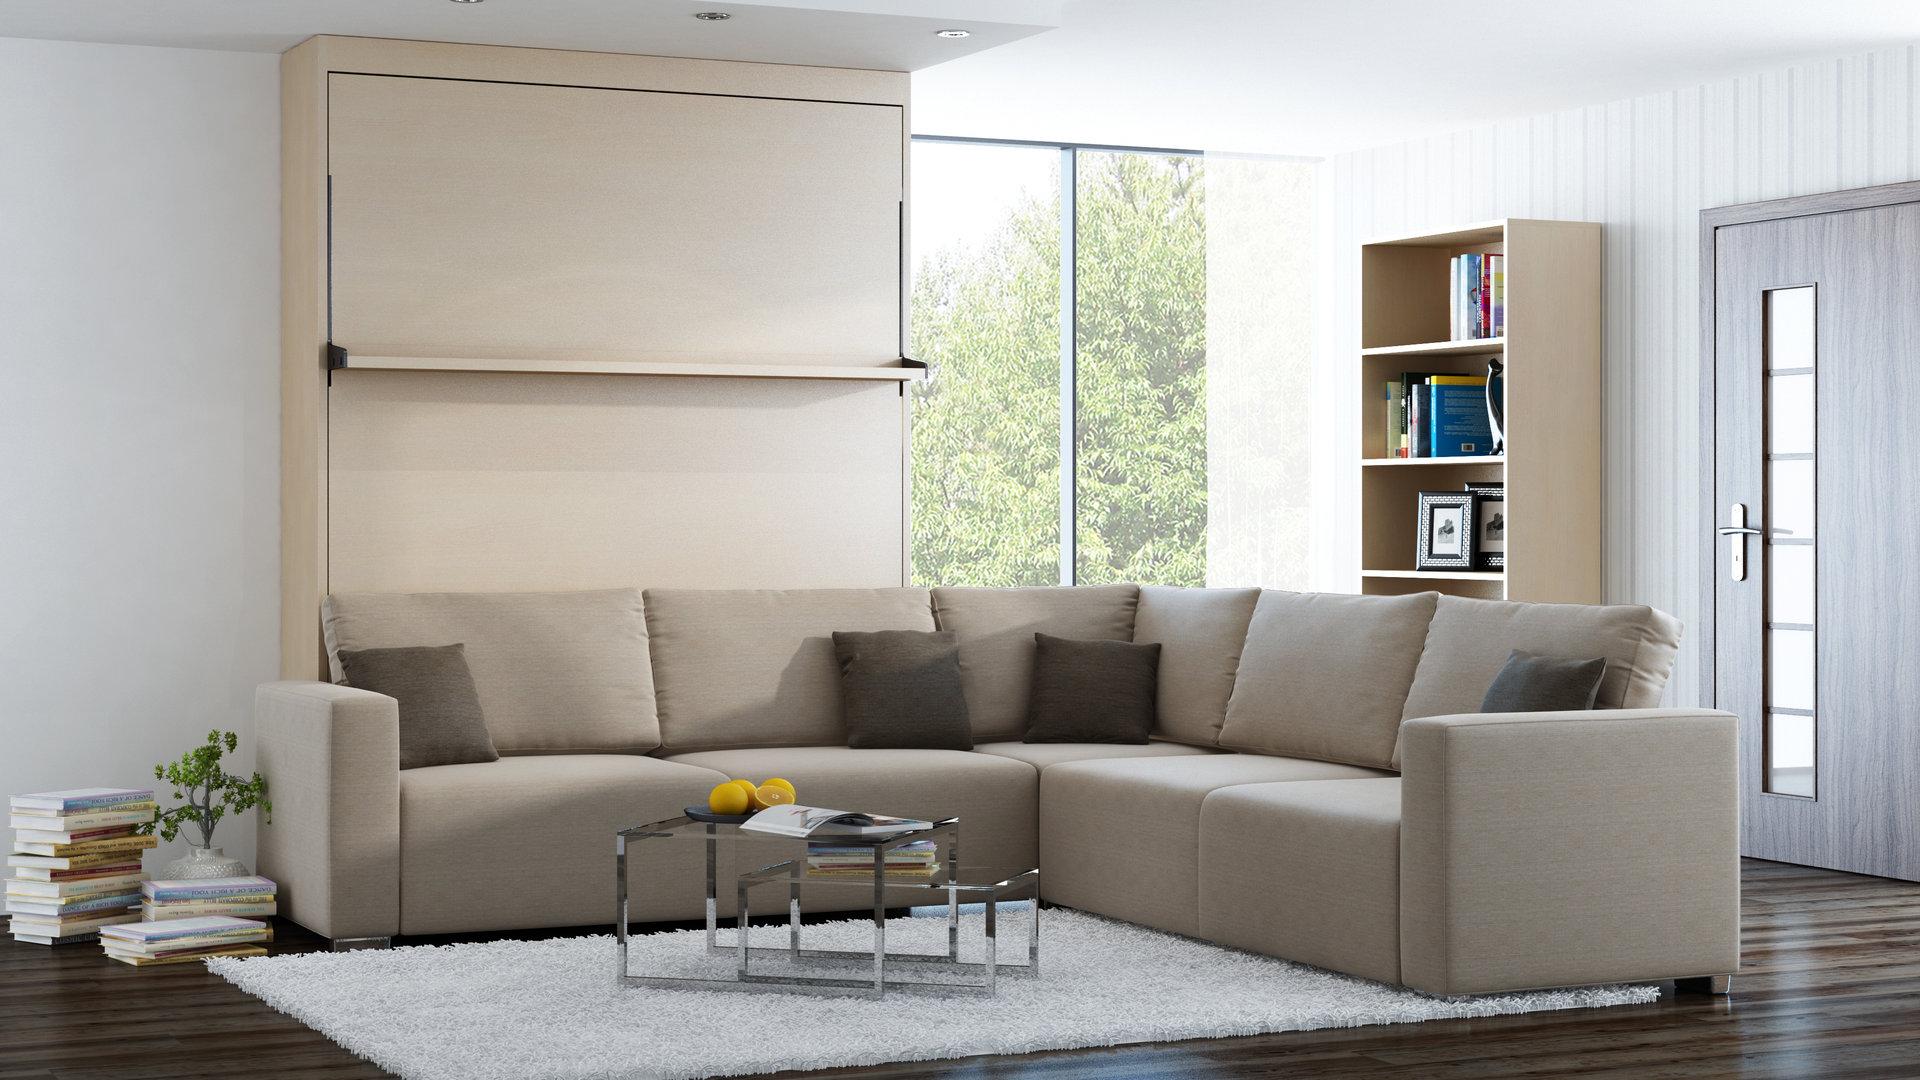 wandbett mit sofa ecke leggio linea std std 140 x 200 cm mainau. Black Bedroom Furniture Sets. Home Design Ideas